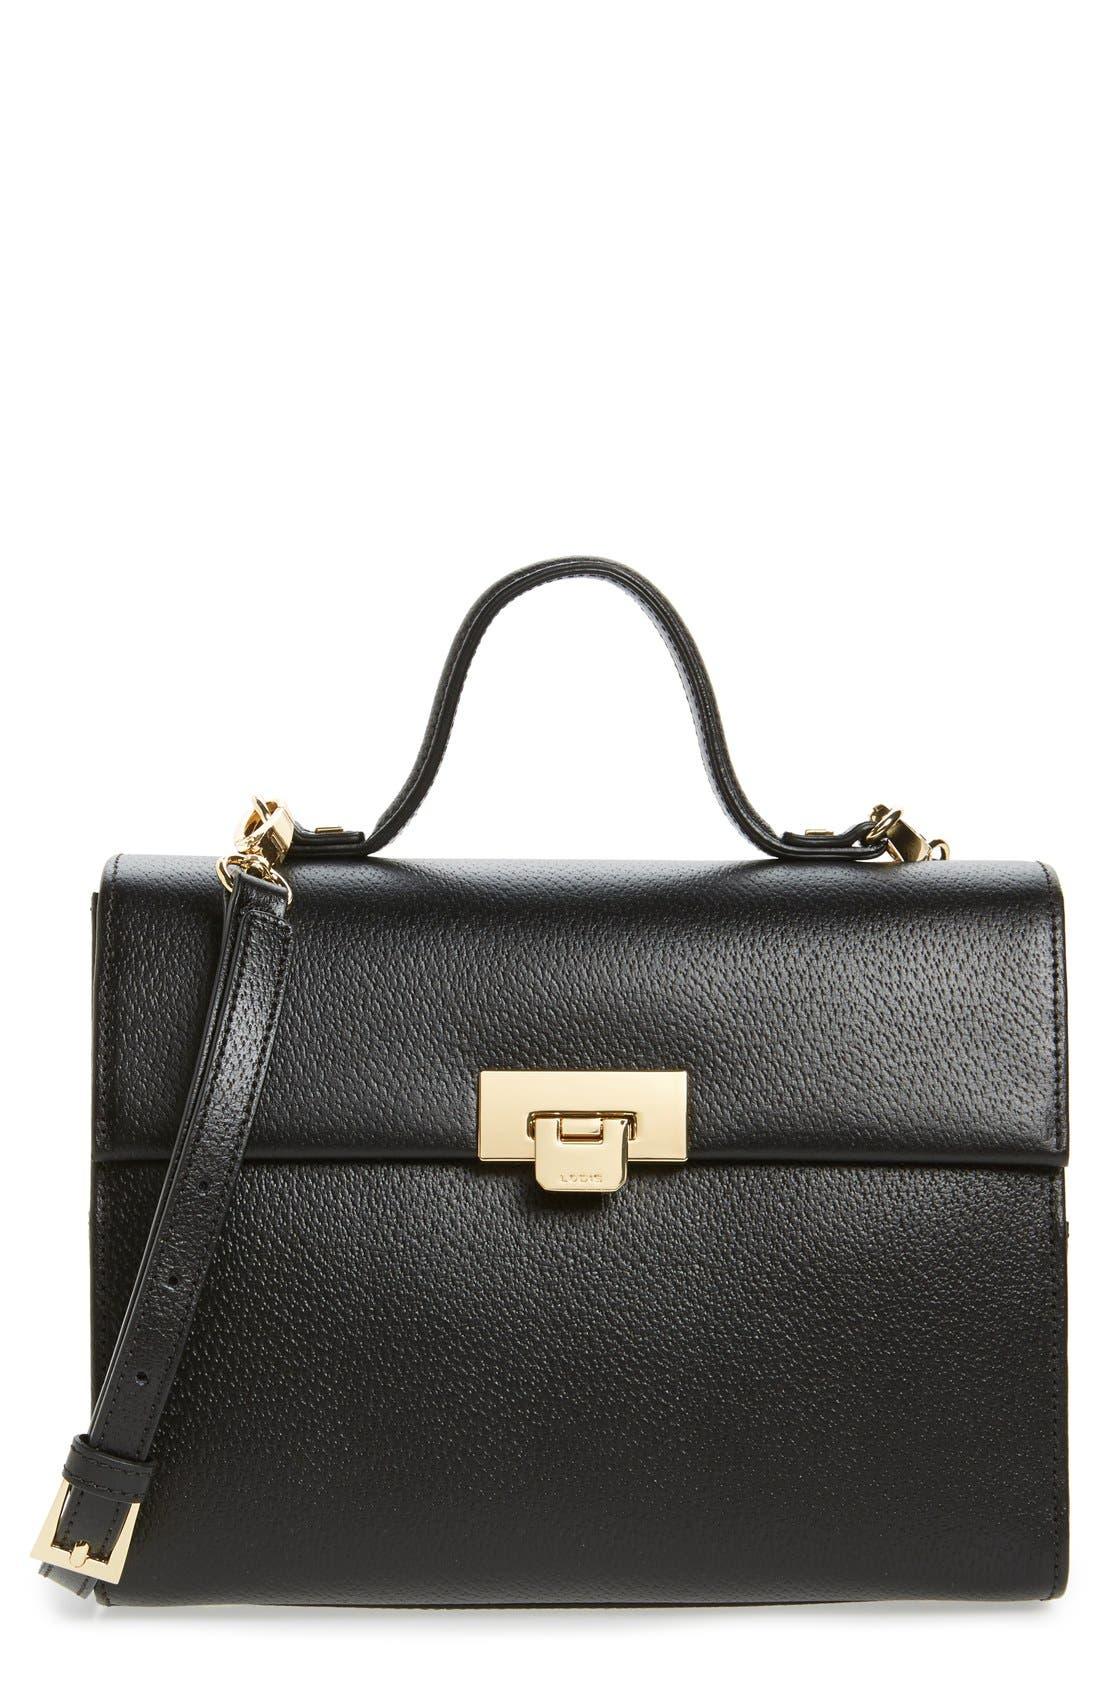 Alternate Image 1 Selected - Lodis Stephanie Under Lock & Key - Medium Bree Leather Crossbody Bag